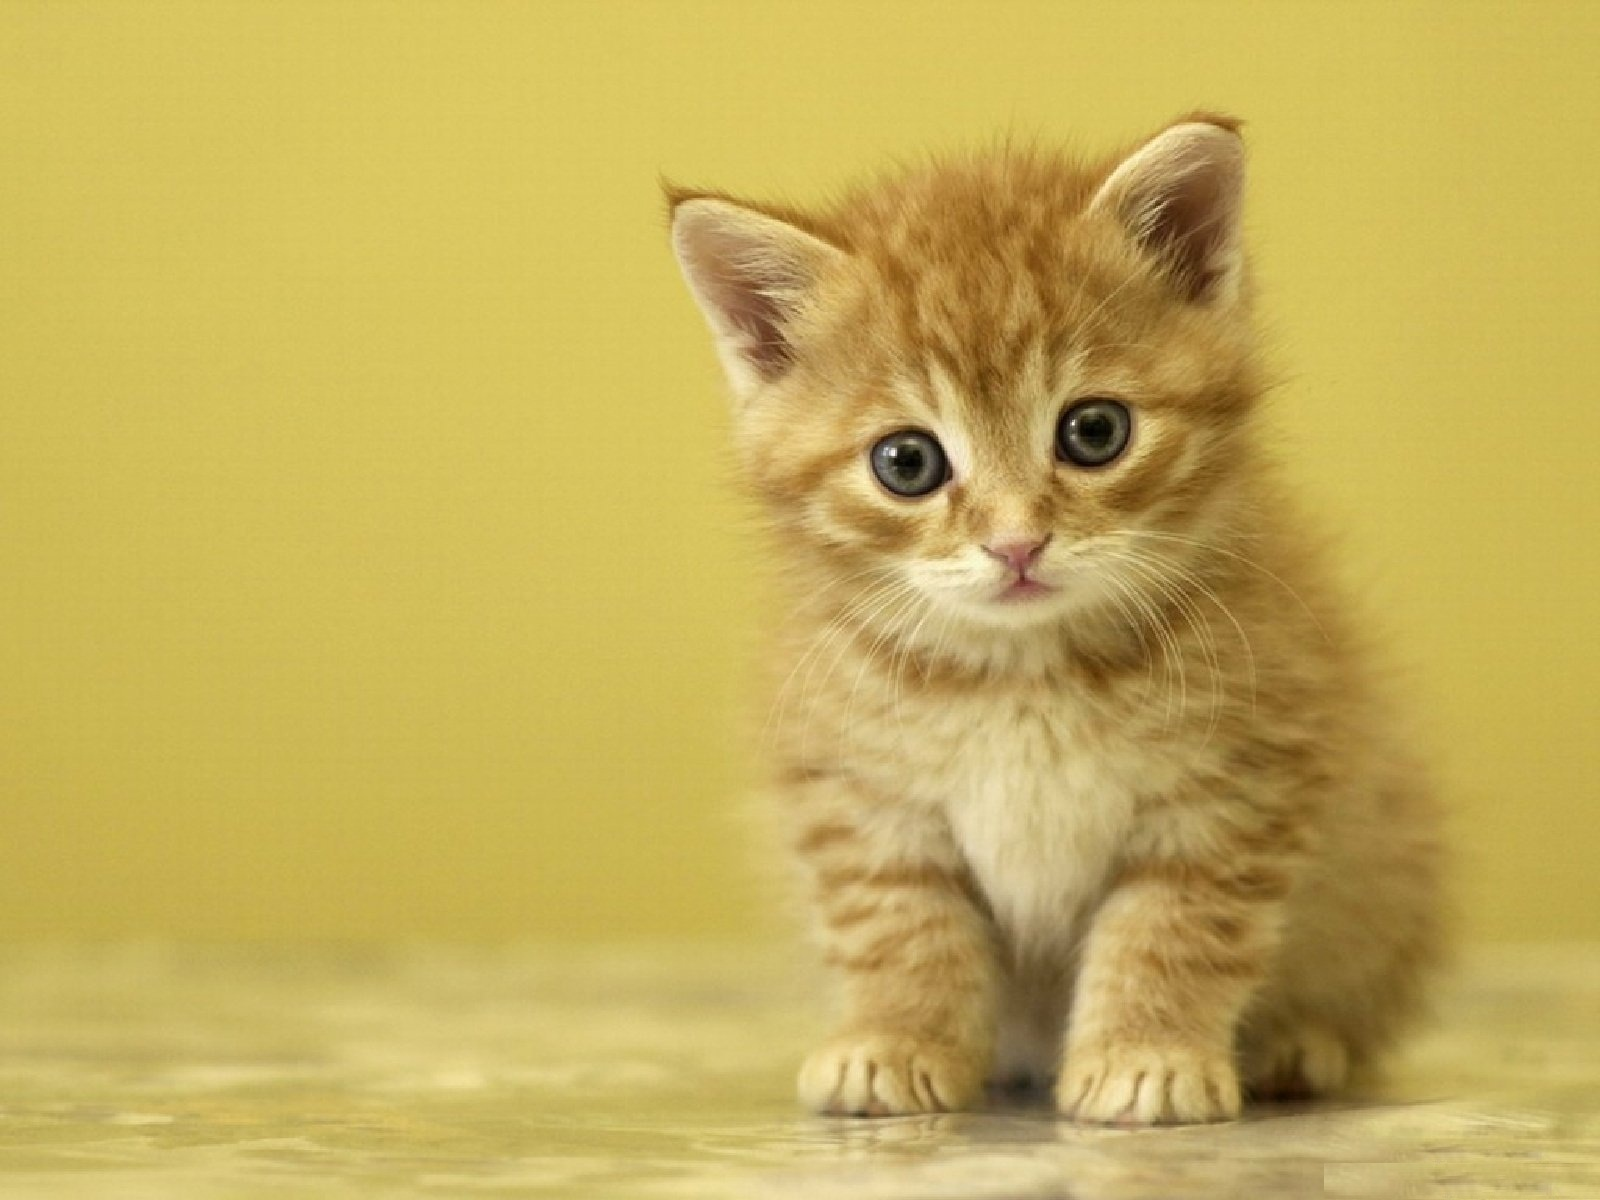 بالصور صور قطط كيوت , اجمل صور قطط رائعة 5727 5